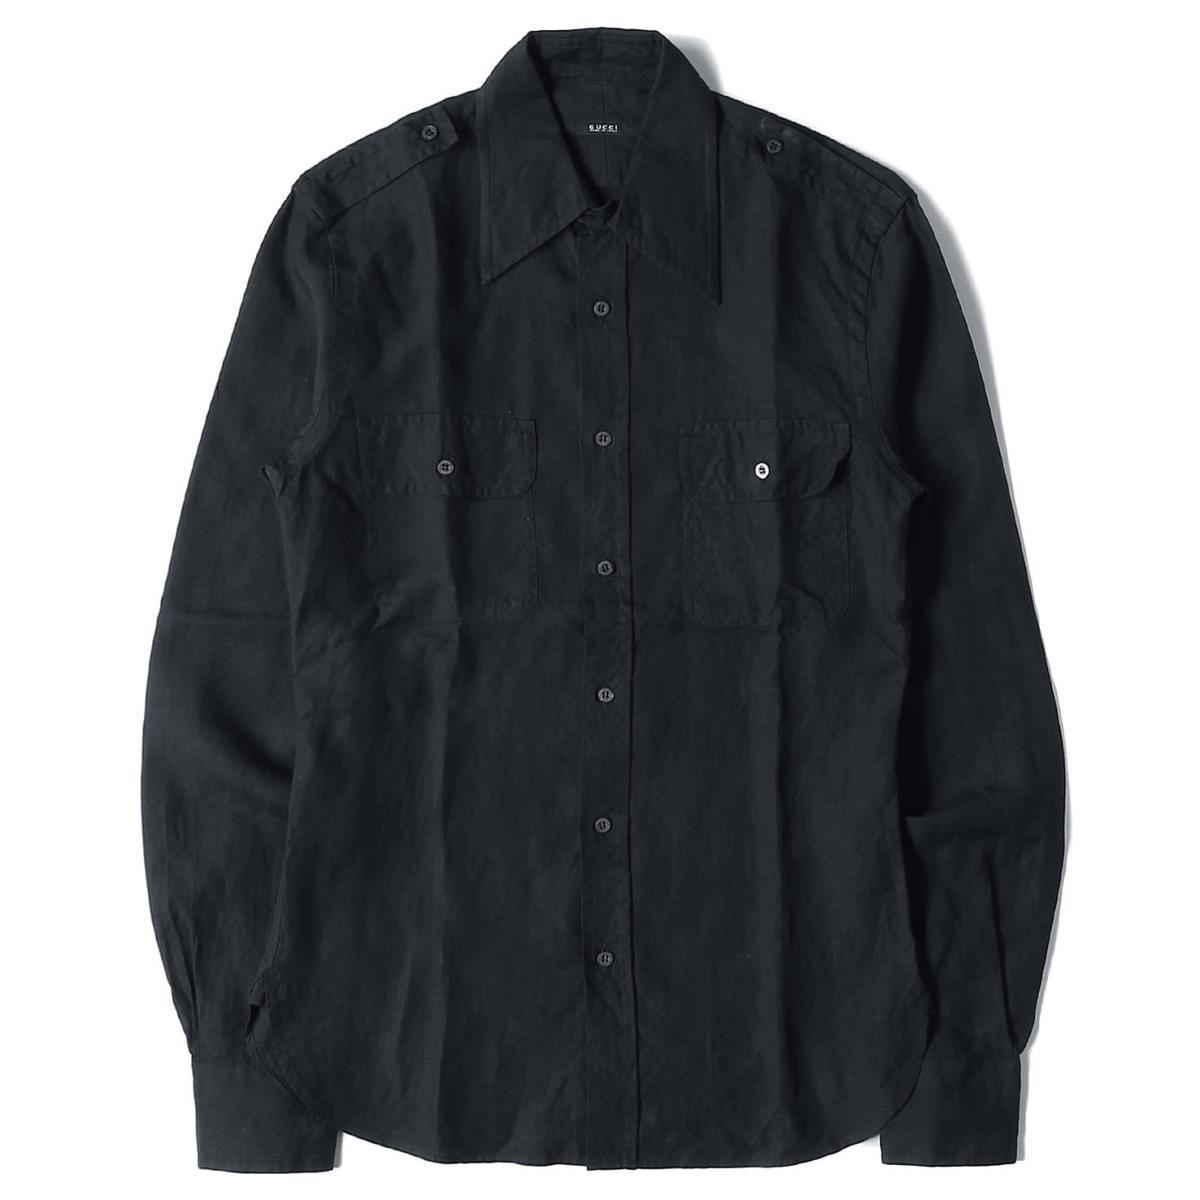 GUCCI グッチ シャツ エポレット付き リネン ボタン シャツ ブラック 38/15 【メンズ】【美品】【中古】【K2558】